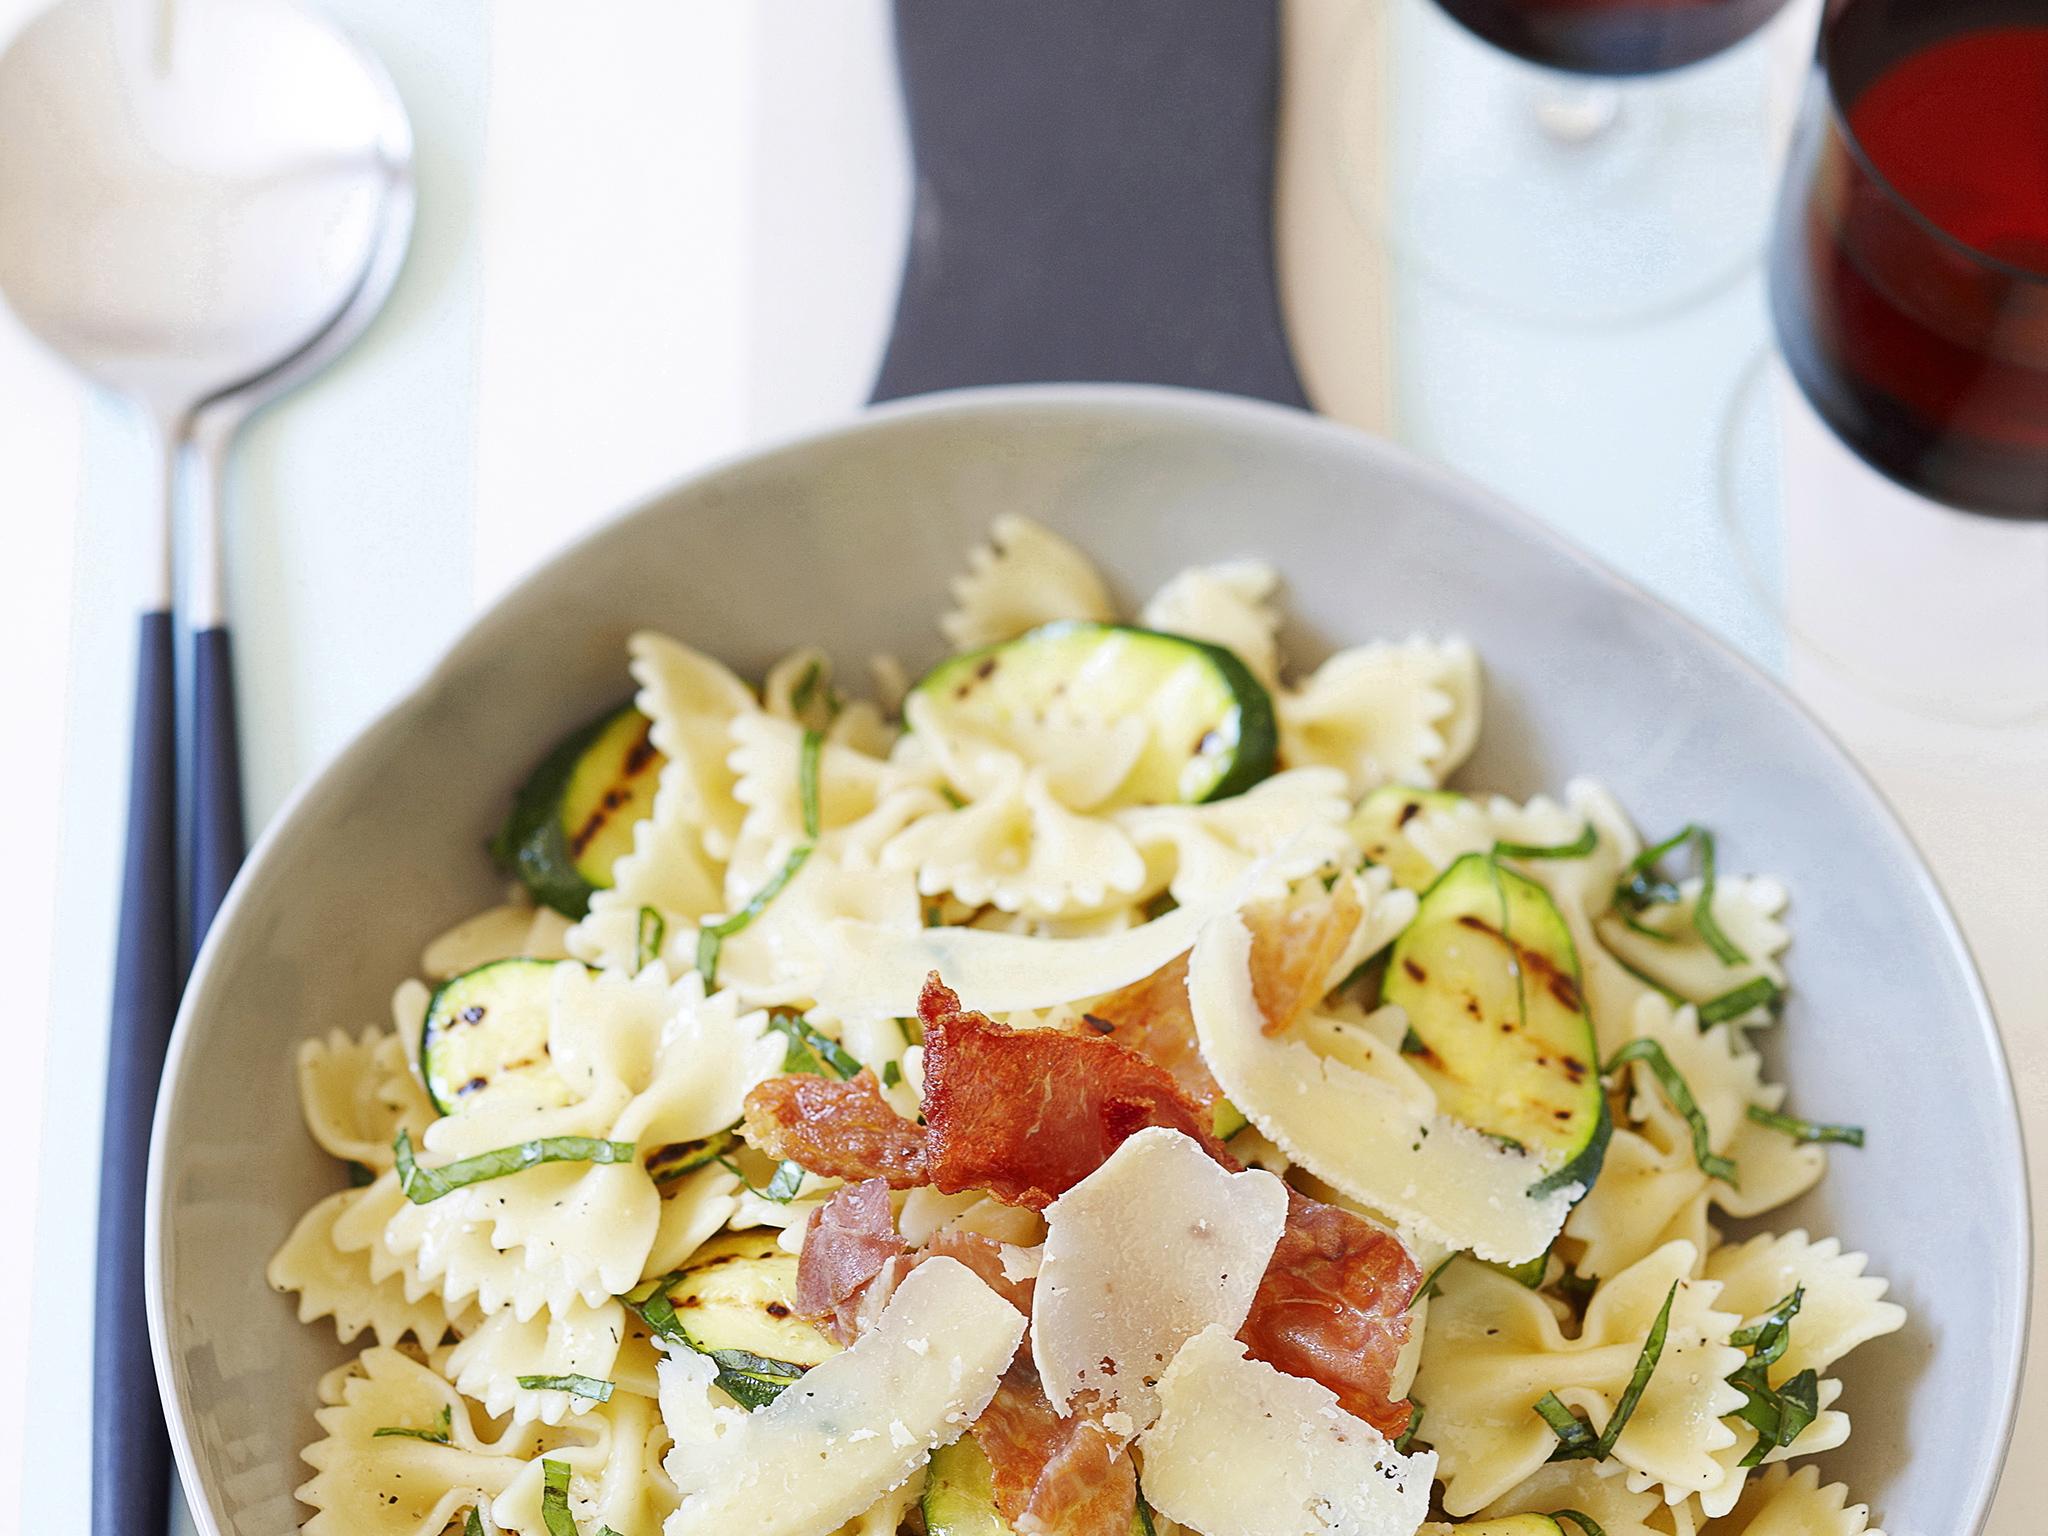 Courgette pasta salad recipe